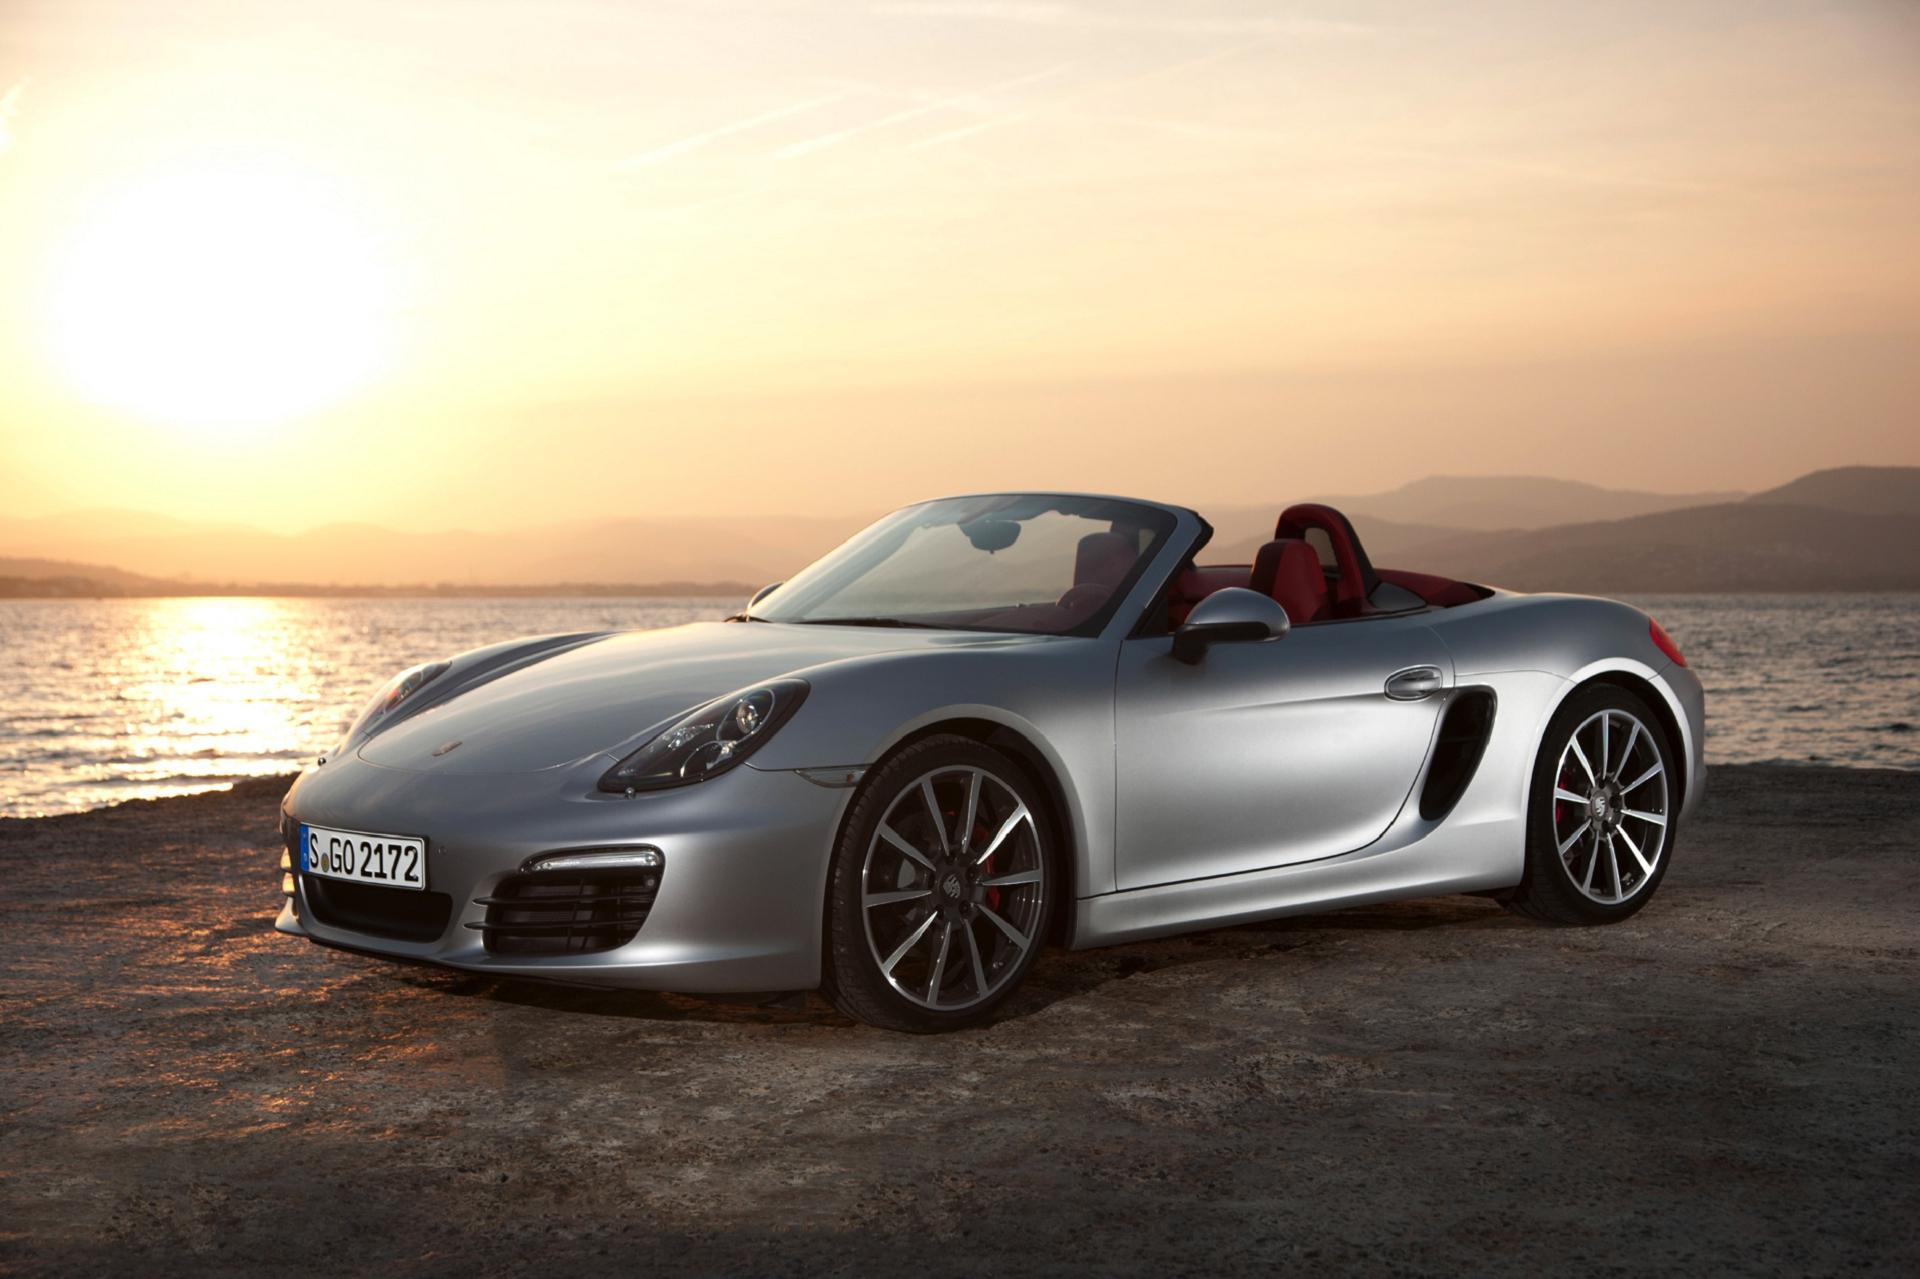 Porsche Boxster Spyder Pictures